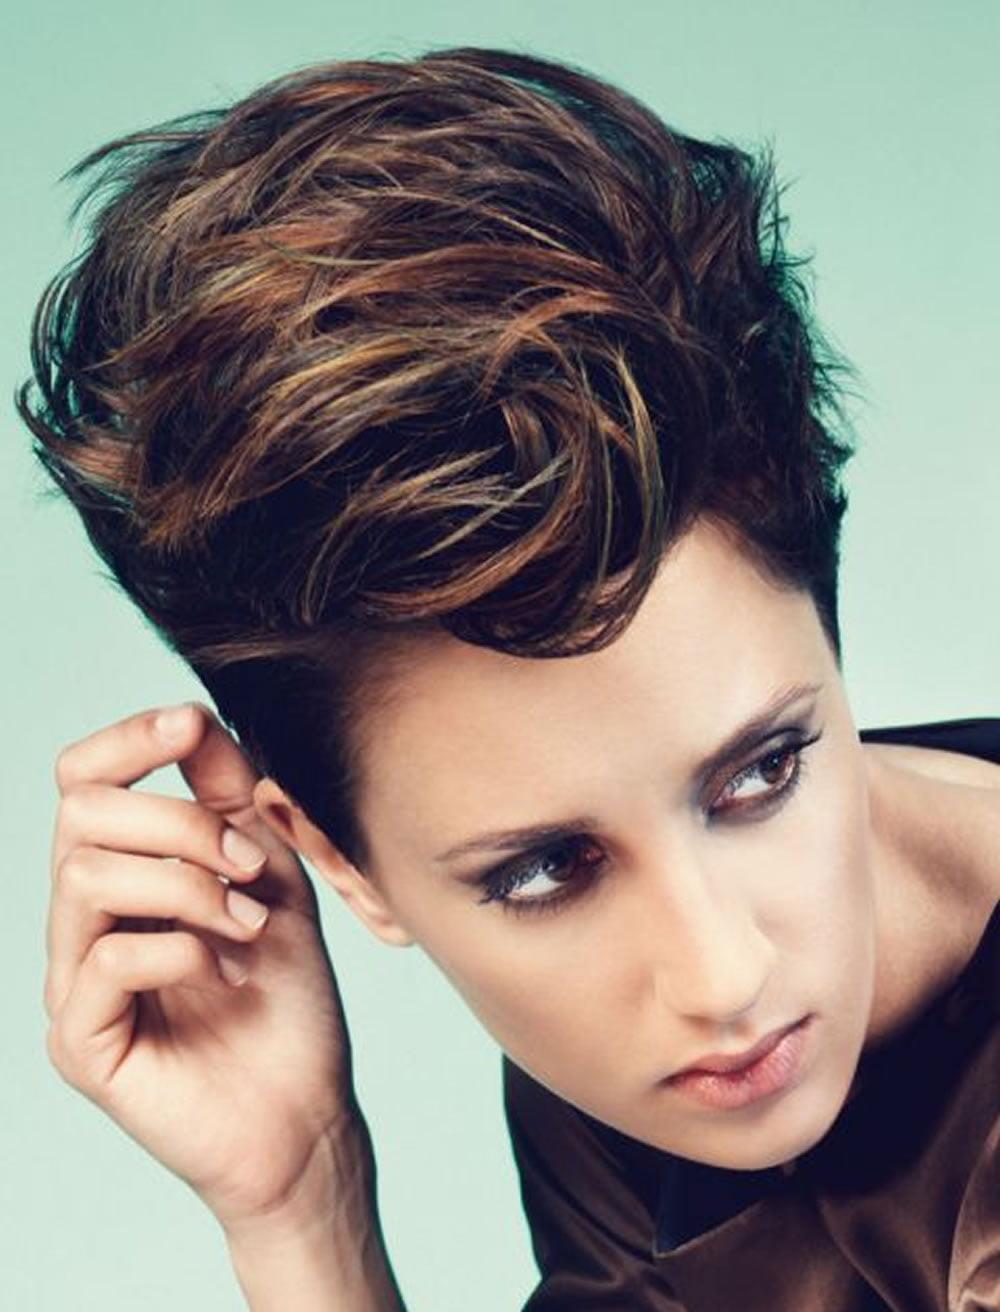 Easy Hairstyles Short Hair Pixie Cuts